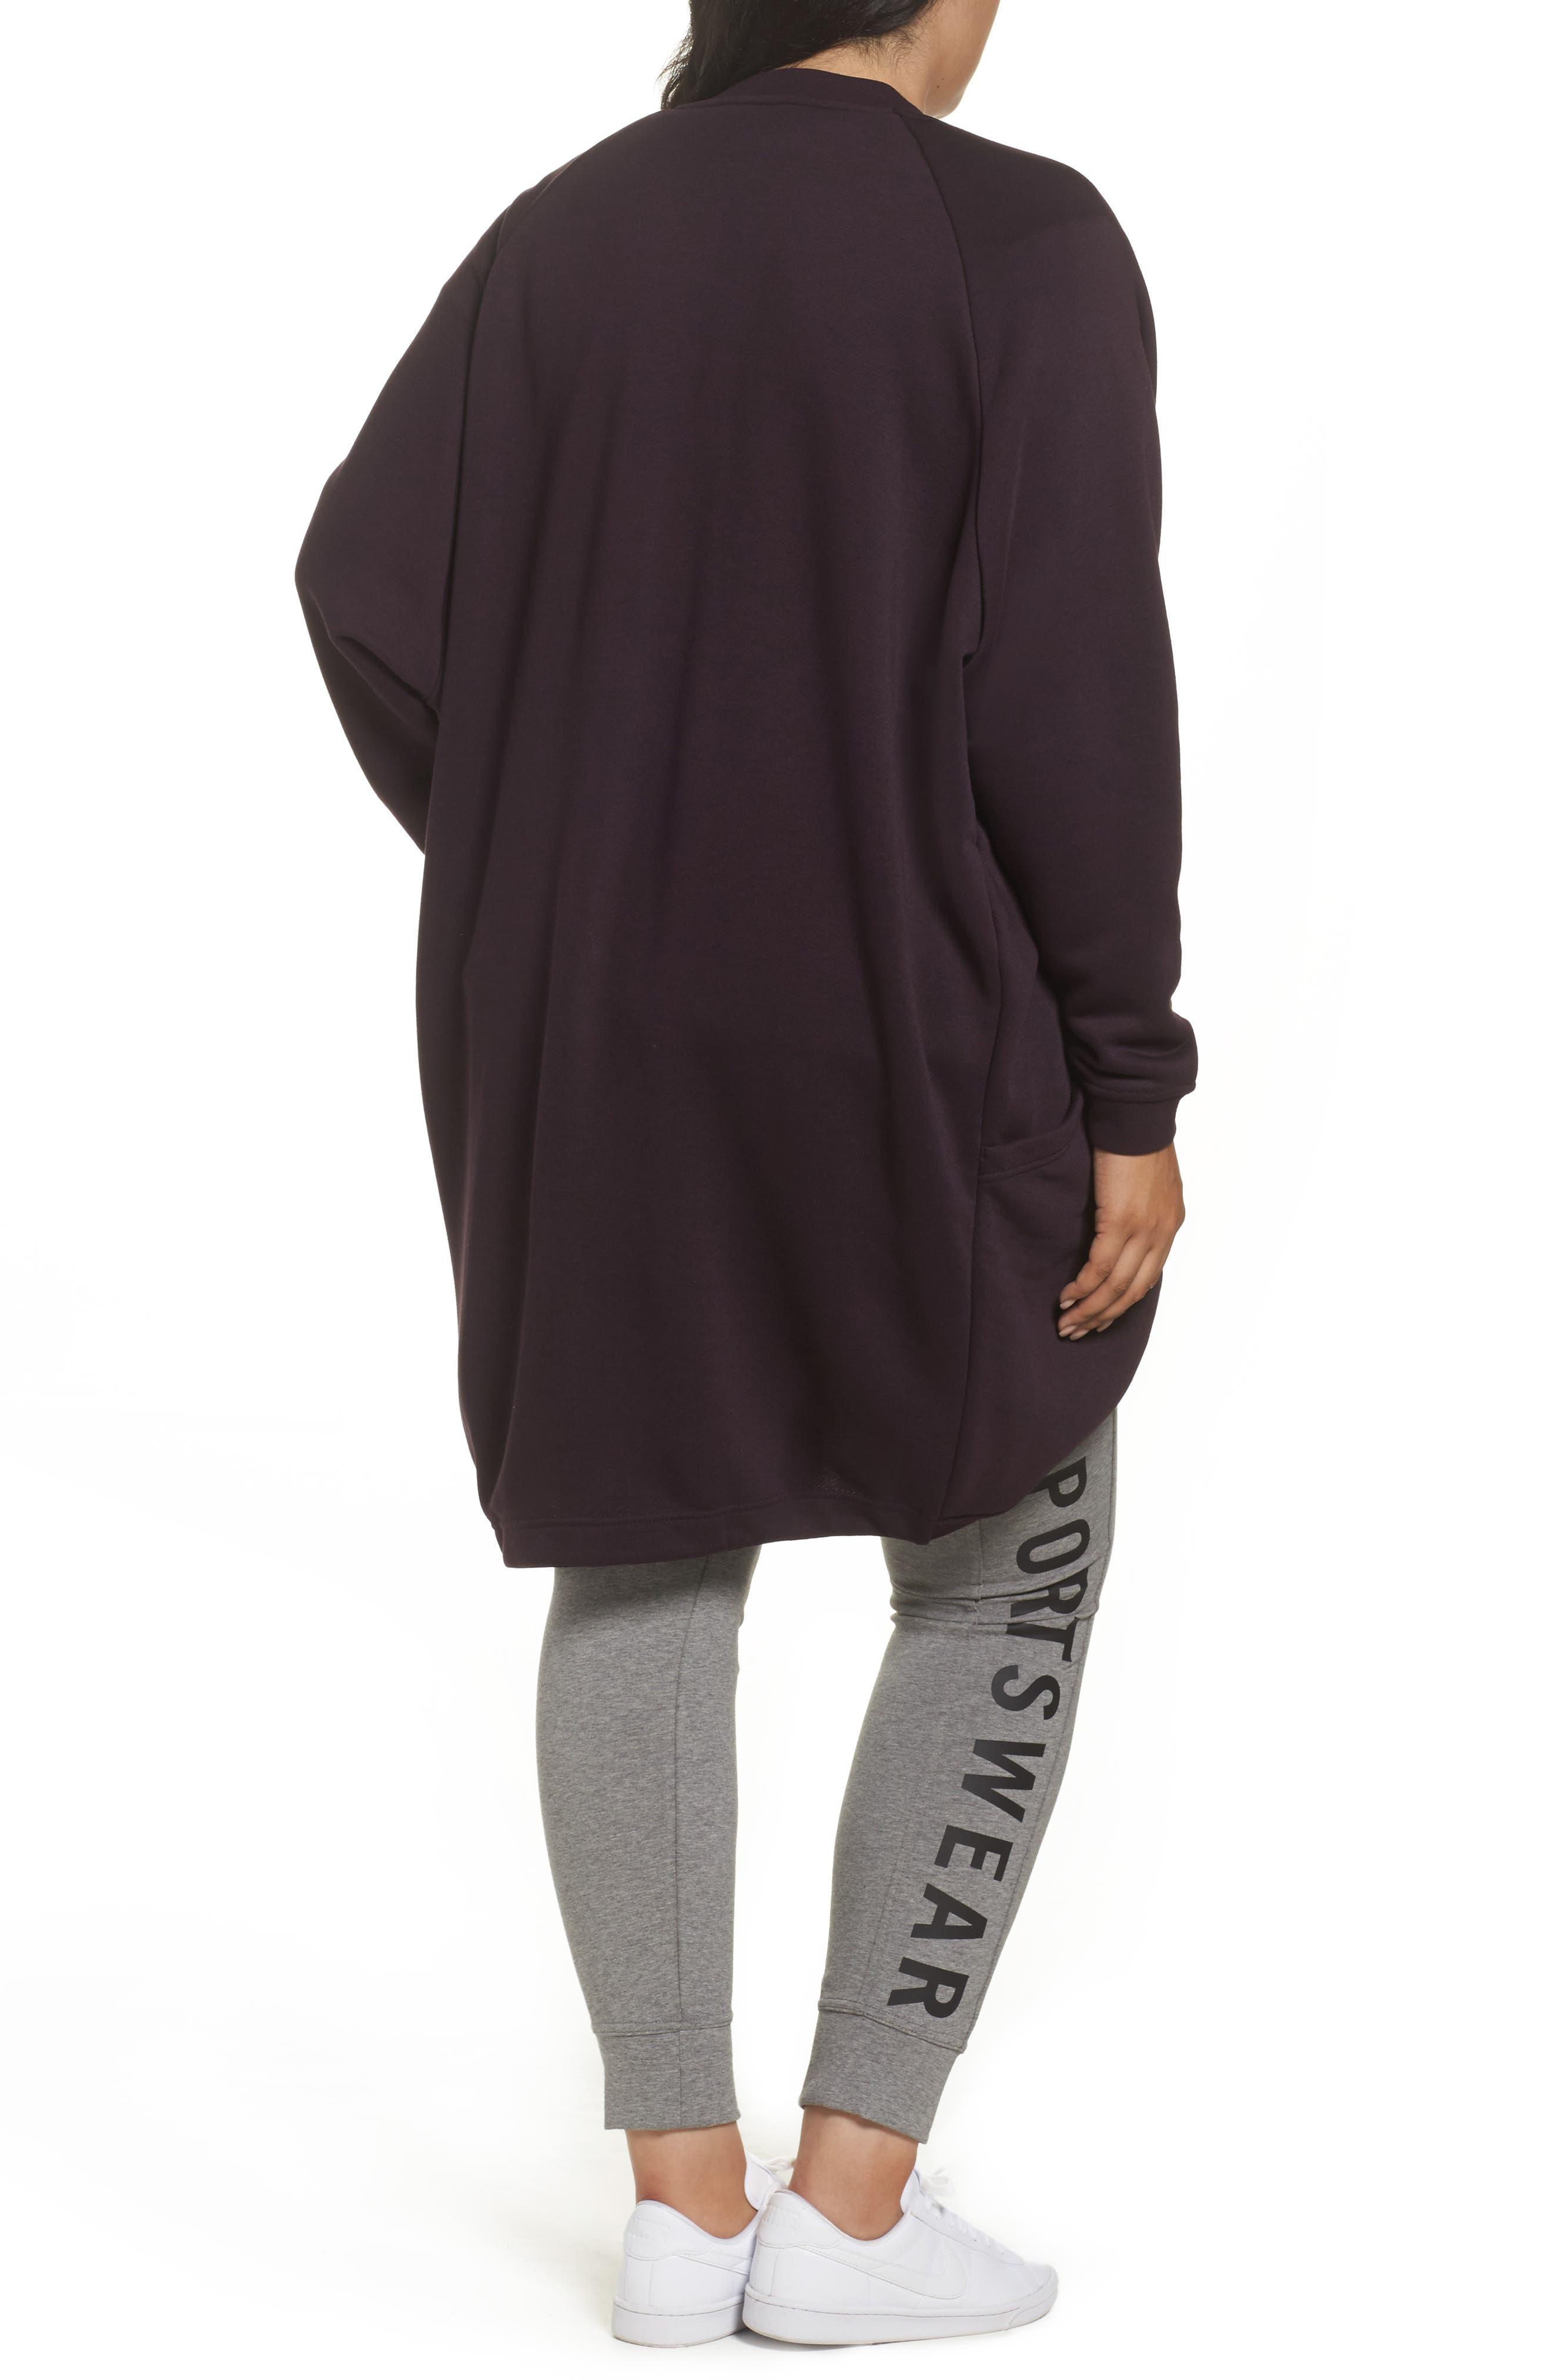 Sportswear Modern Cardigan,                             Alternate thumbnail 2, color,                             Port Wine/ Port Wine